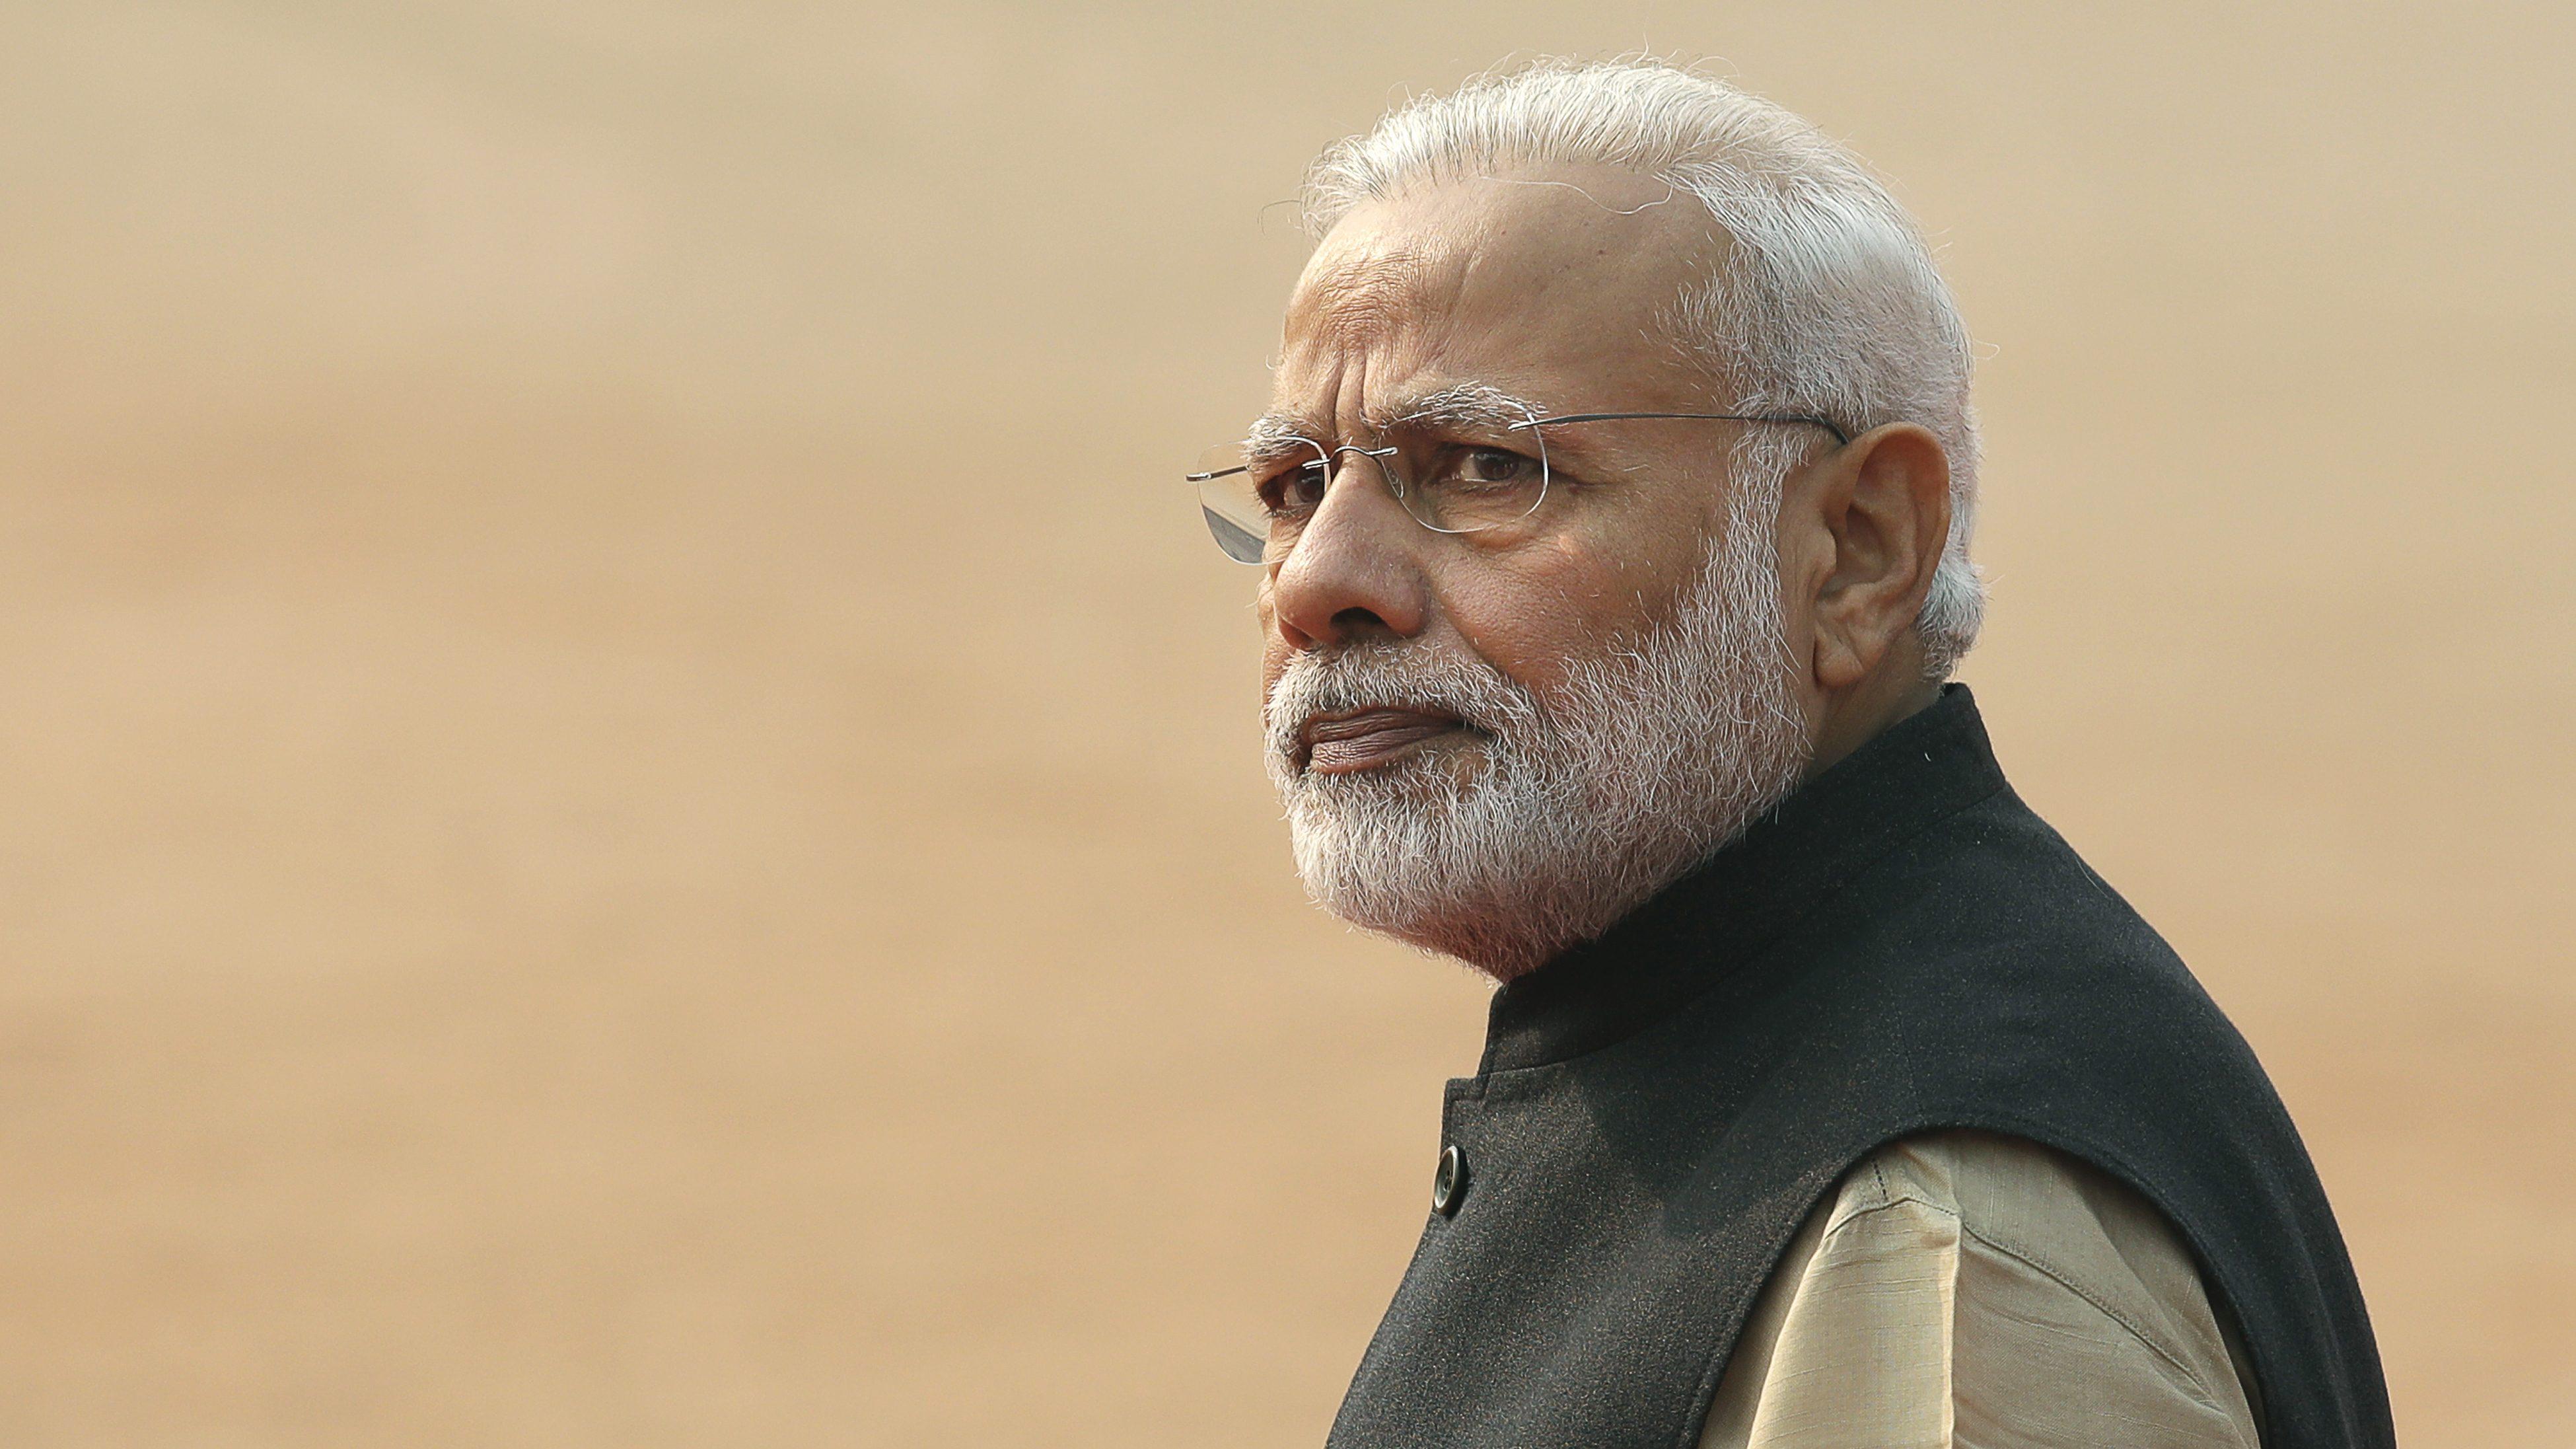 Indian Prime Minister Narendra Modi arrives for the ceremonial reception of visiting Israeli President Reuven Rivlin, in New Delhi, India, Tuesday, Nov. 15, 2016.